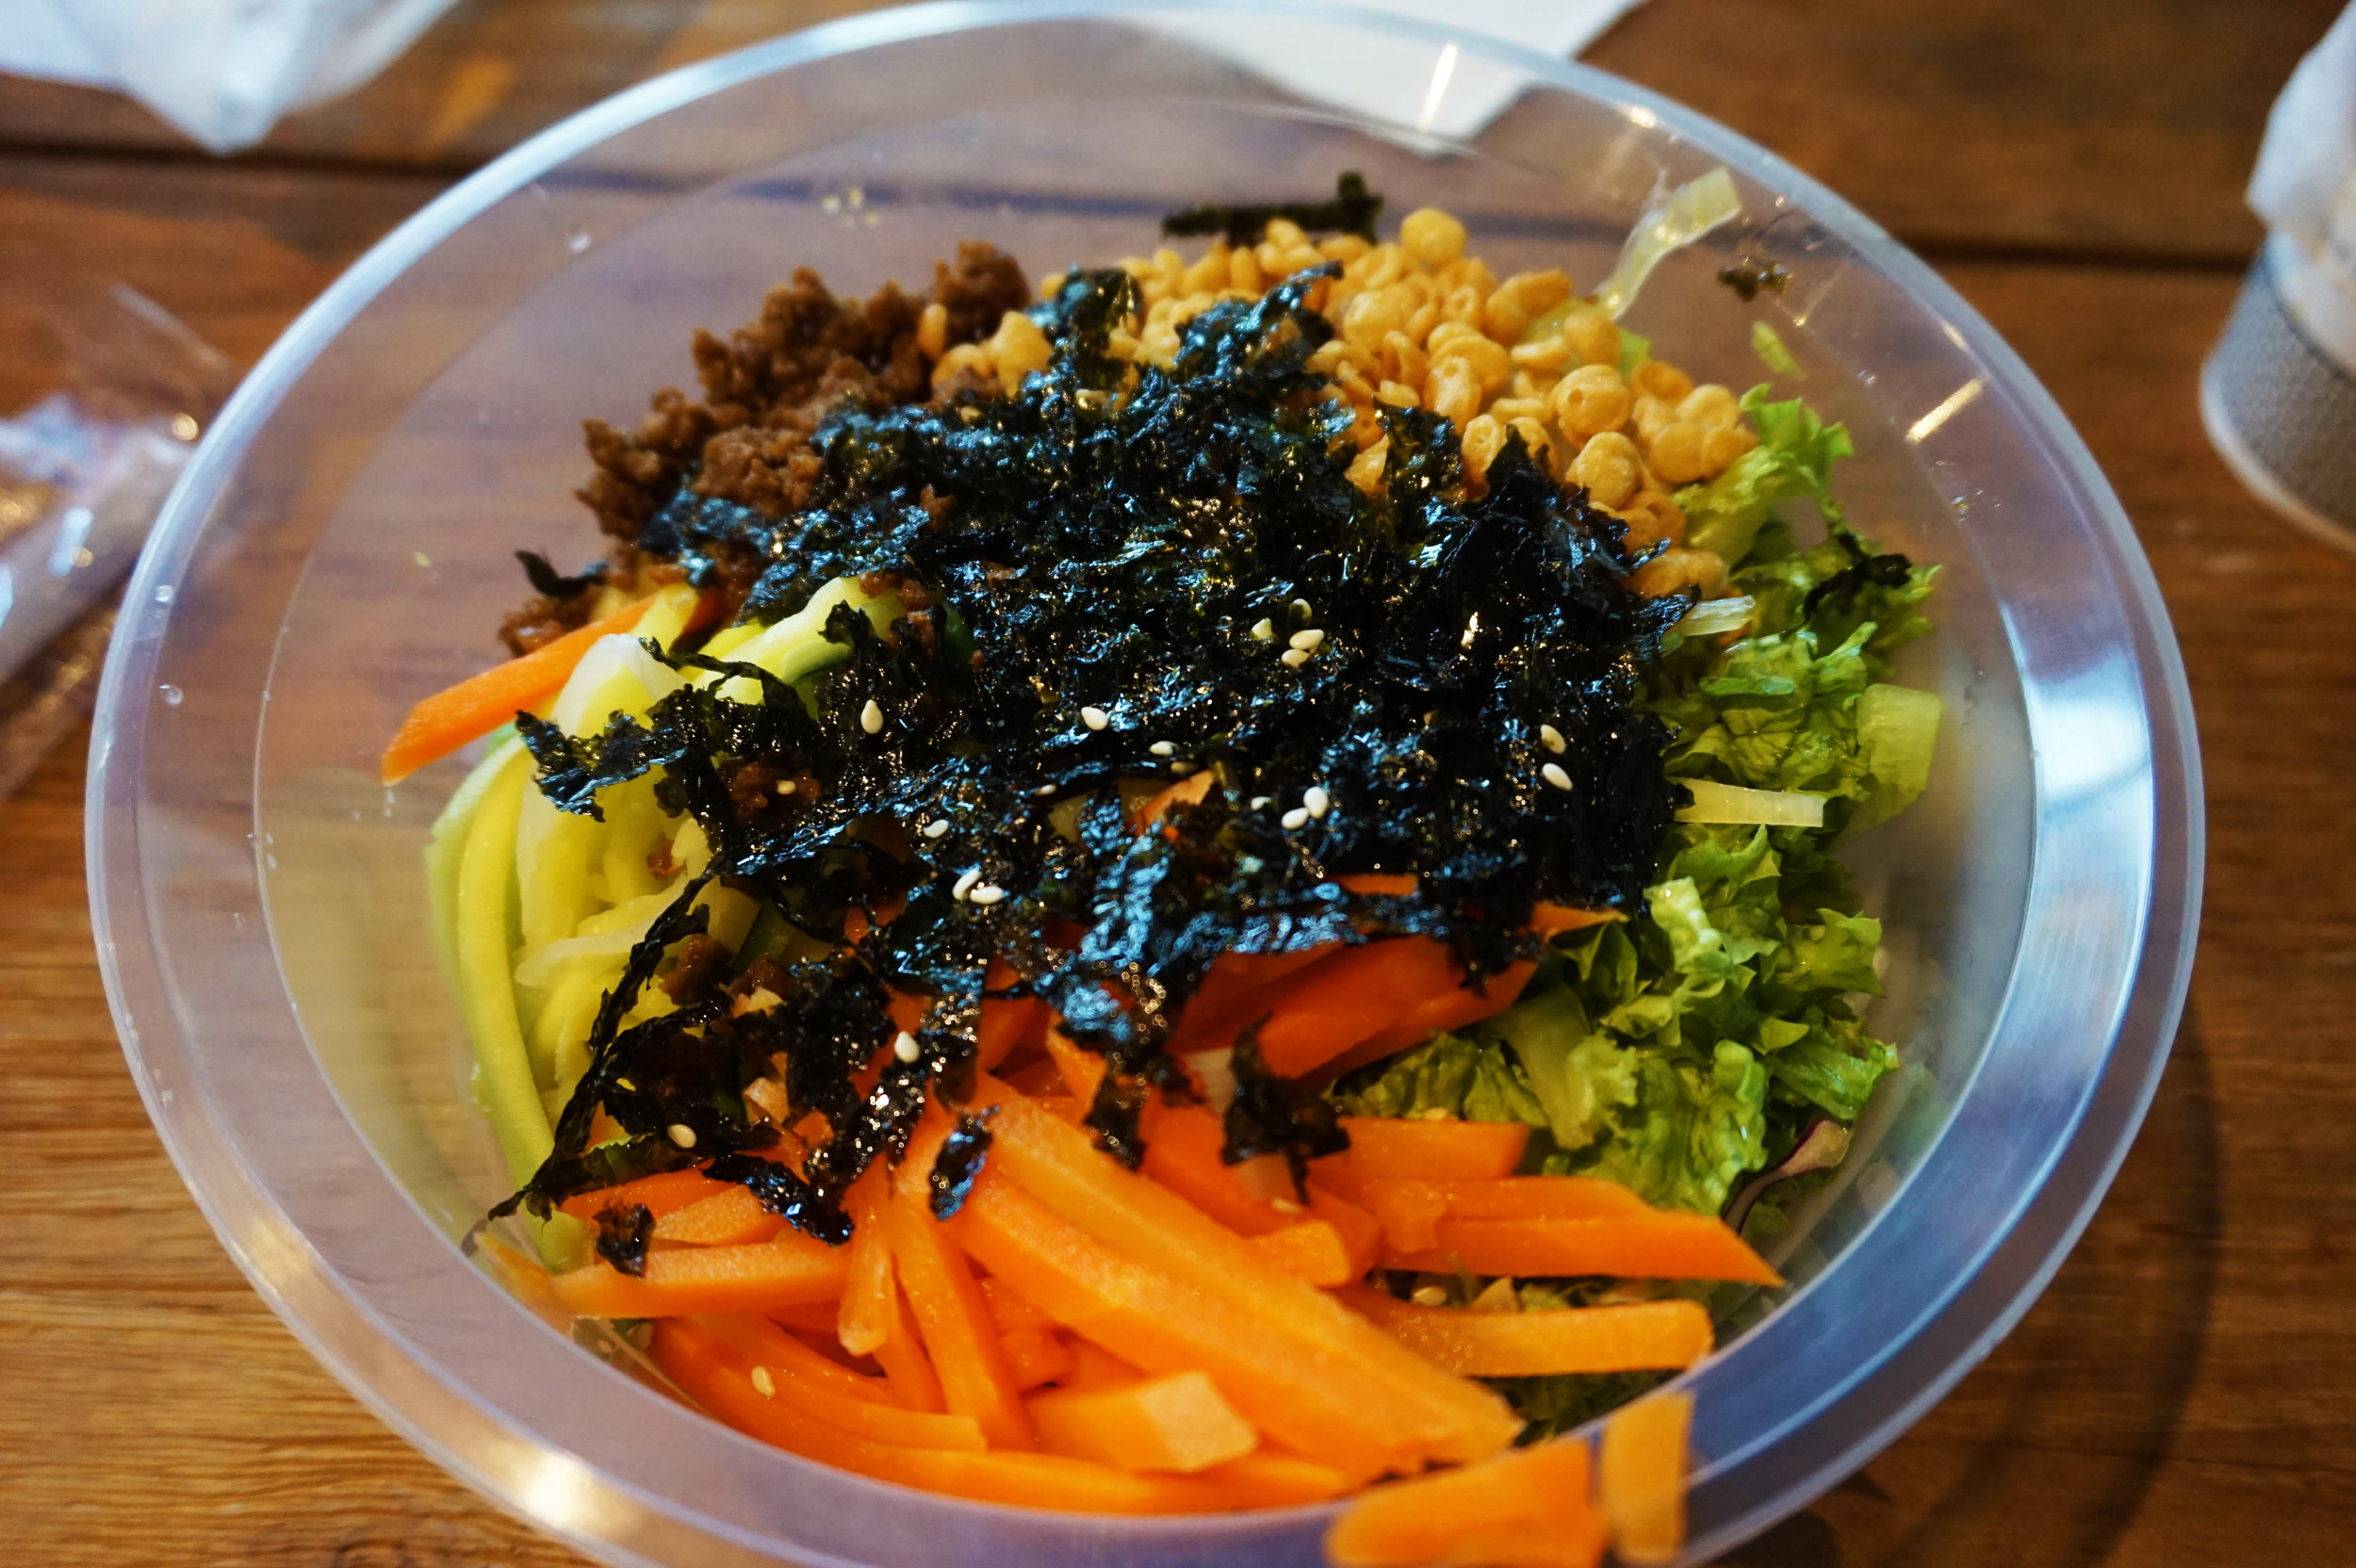 Warm soy sauce noodles from Paik's Bibimbap